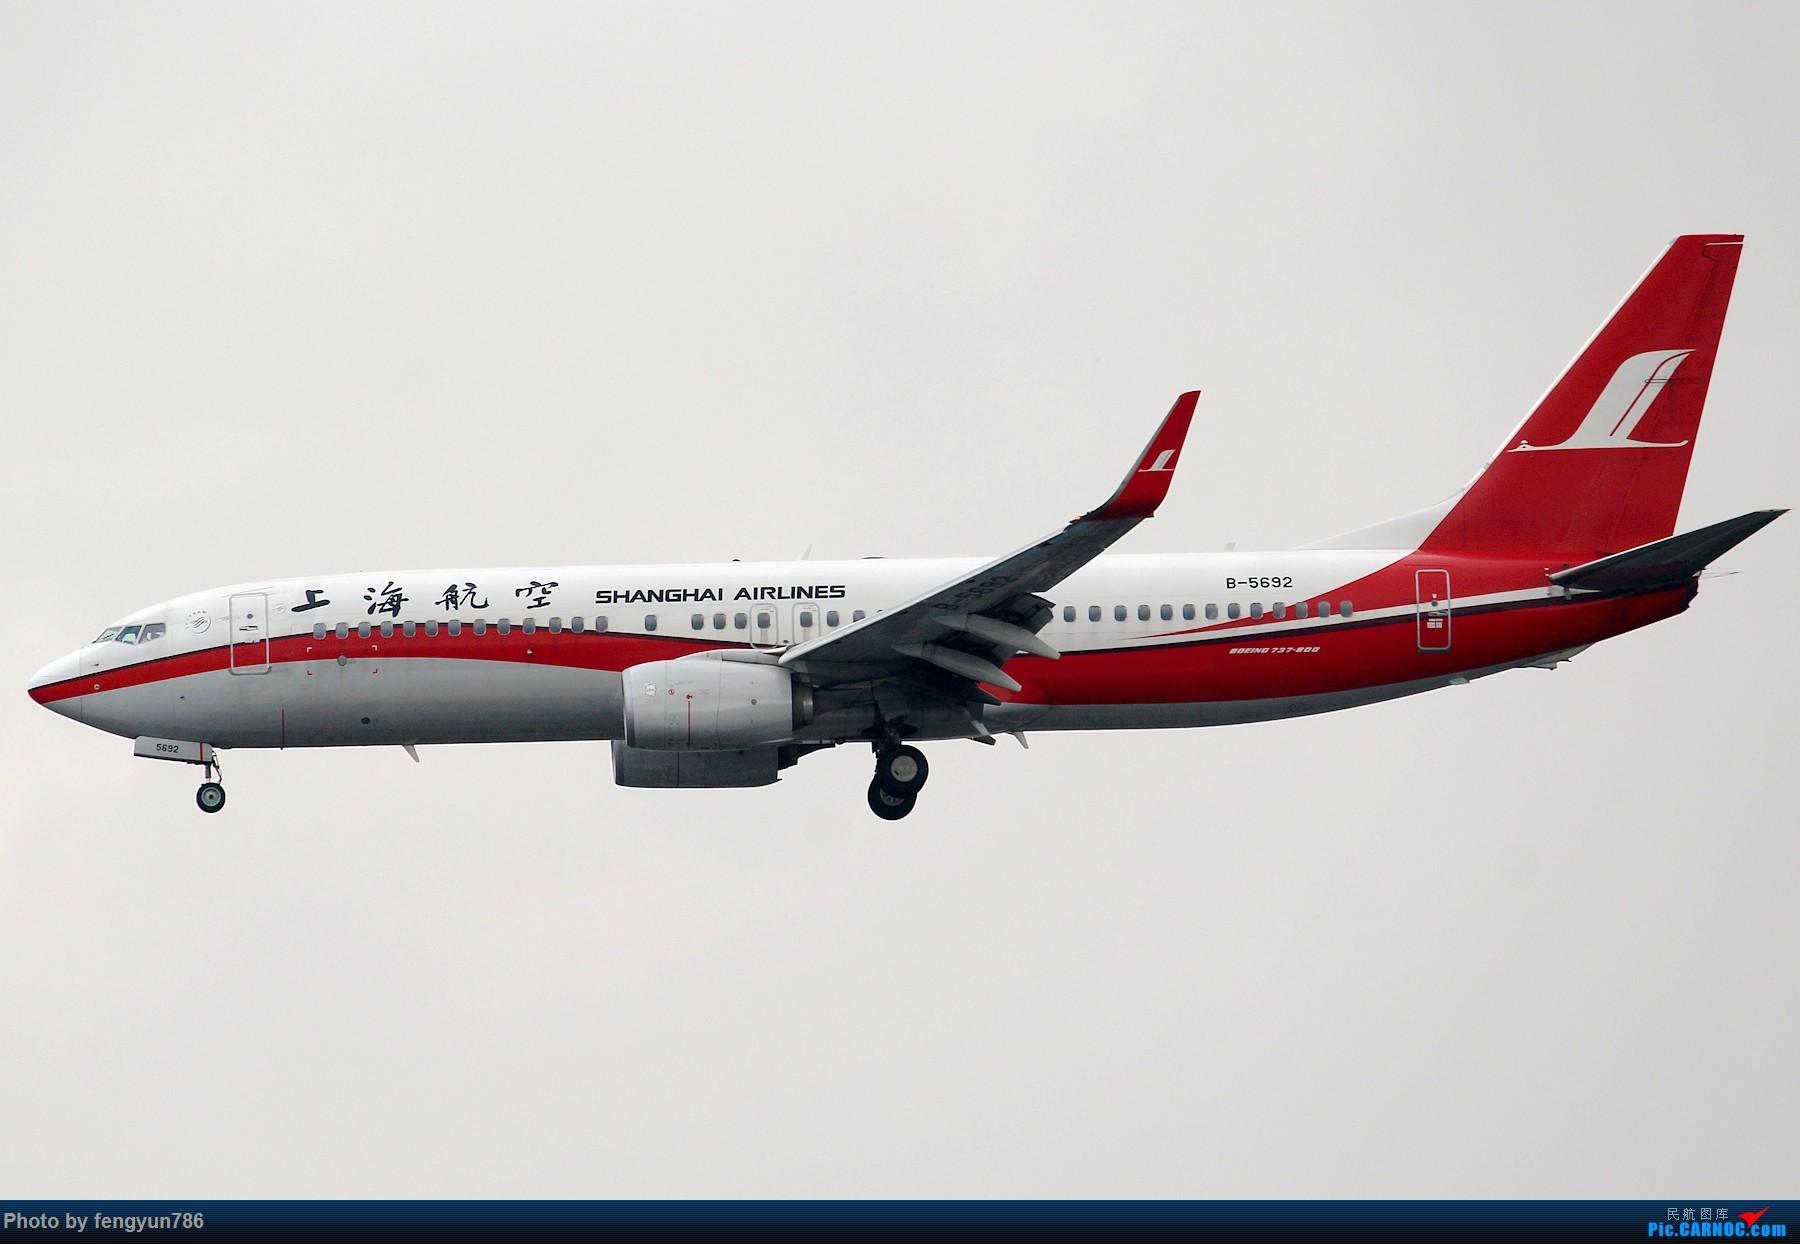 Re:[原创]新人首贴,6.18 SHA流水账 BOEING 737-800 B-5692 中国上海虹桥国际机场